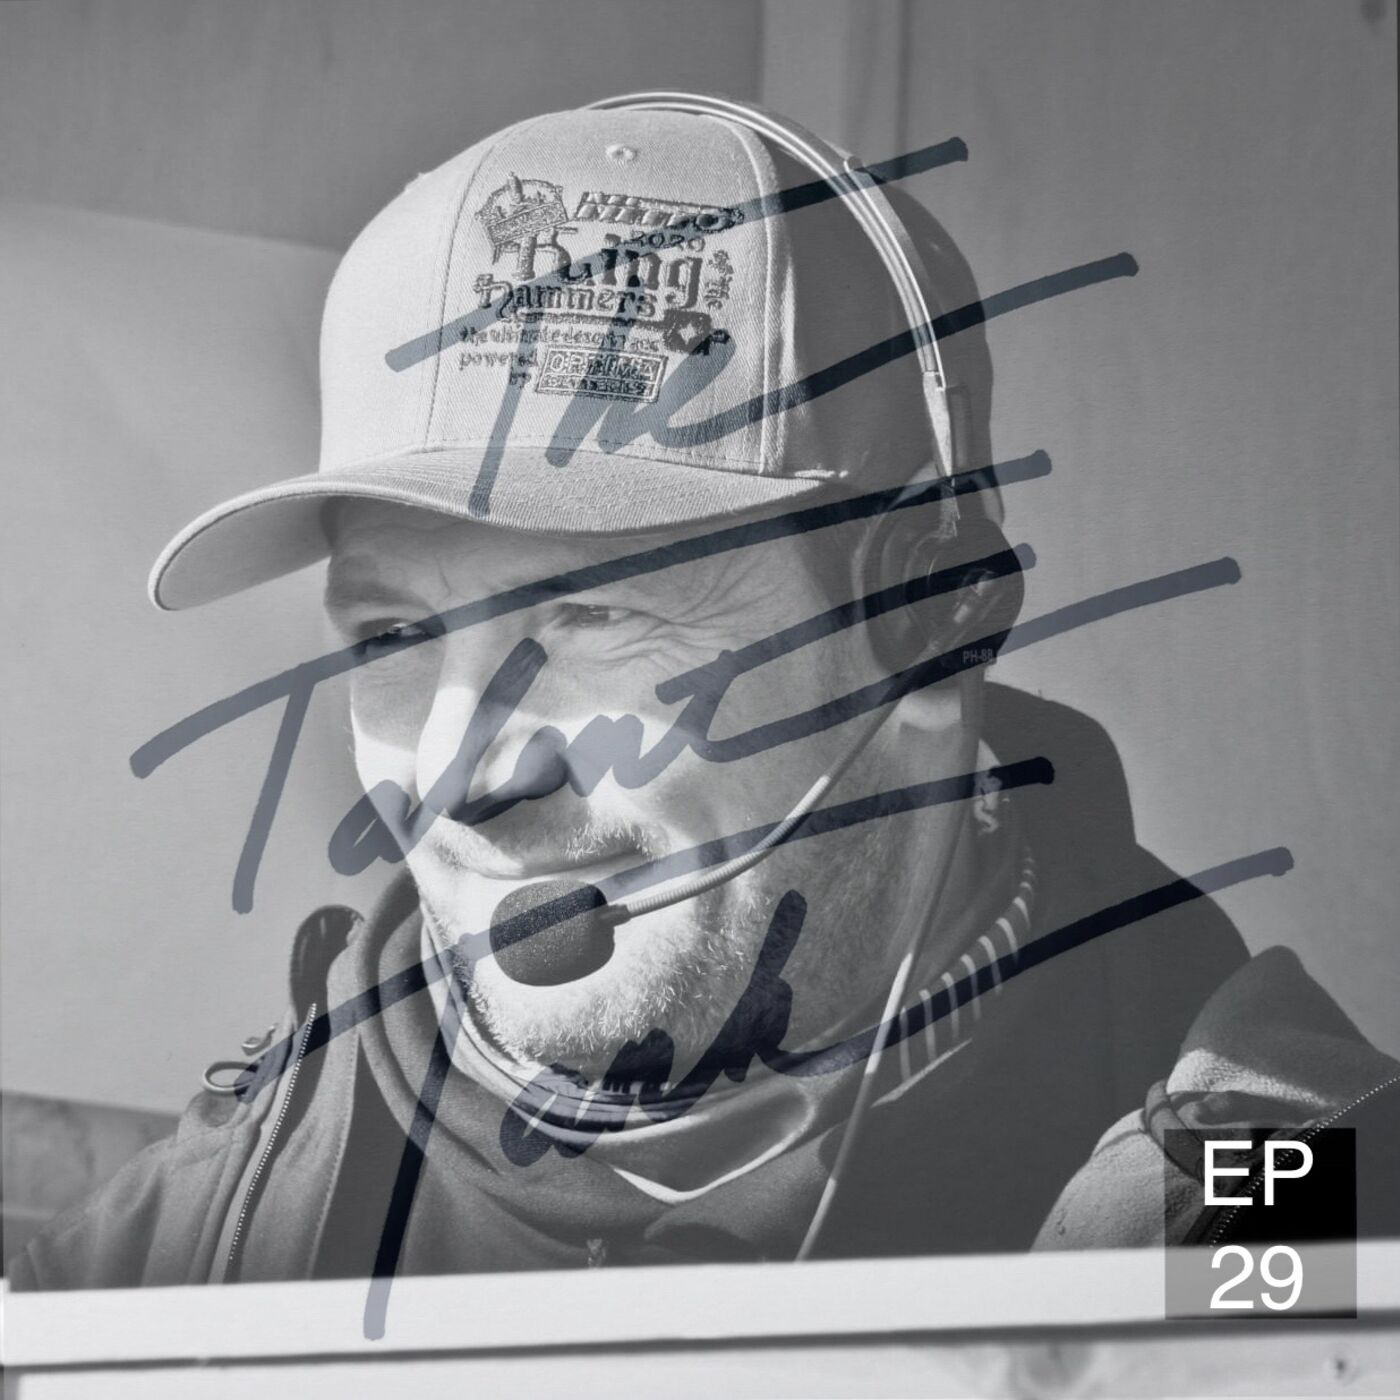 EP 29 Jim Marsden